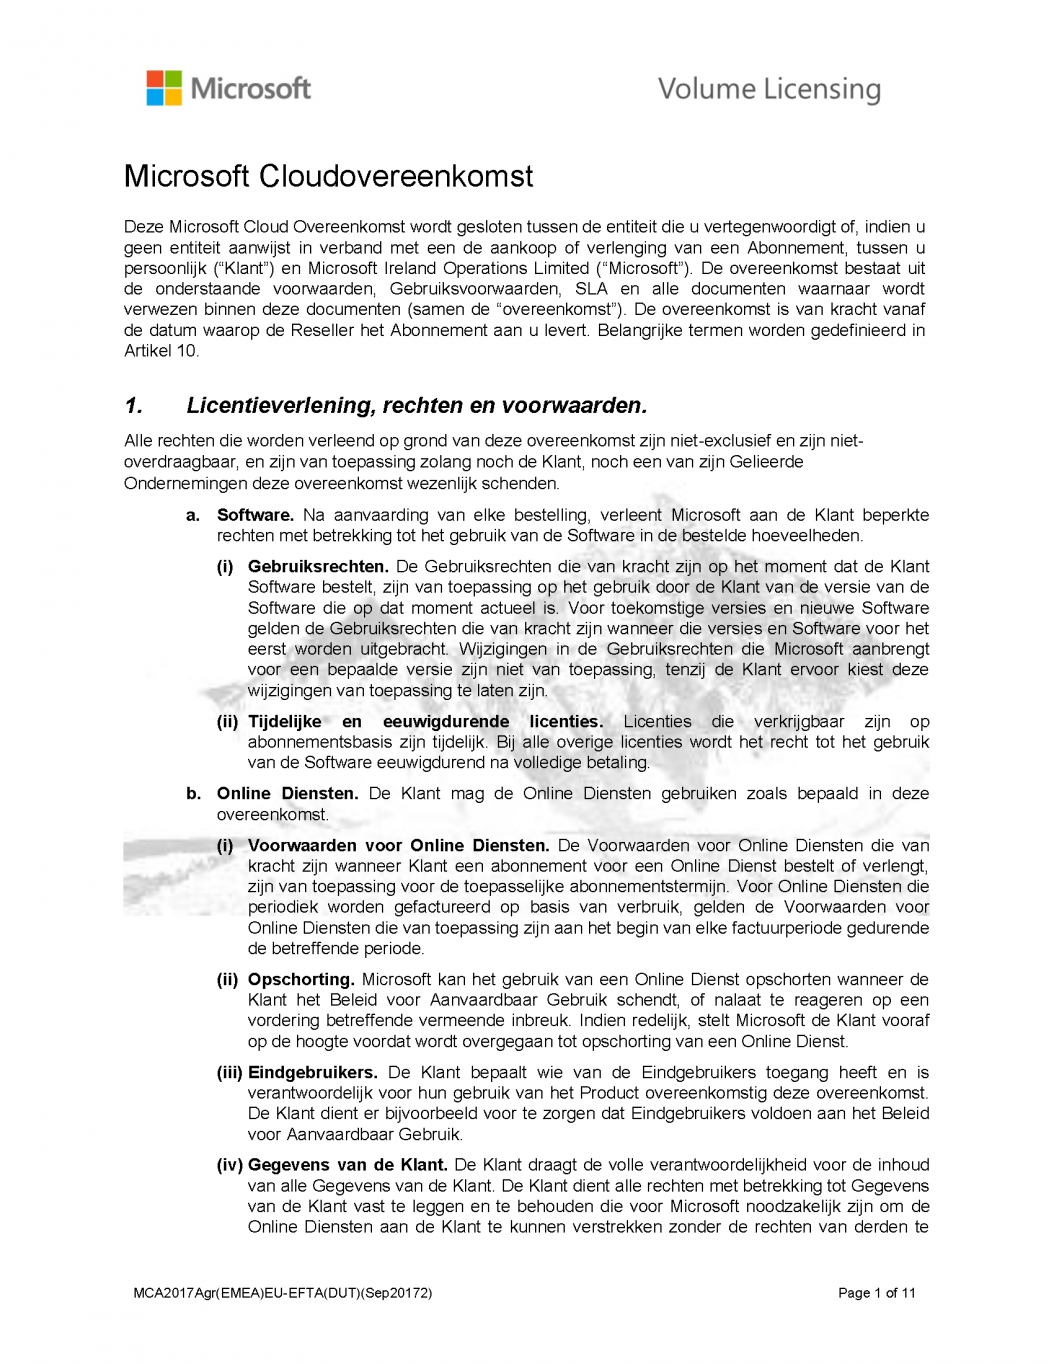 Microsoft MCA 2017 Dutch_Page_01.png